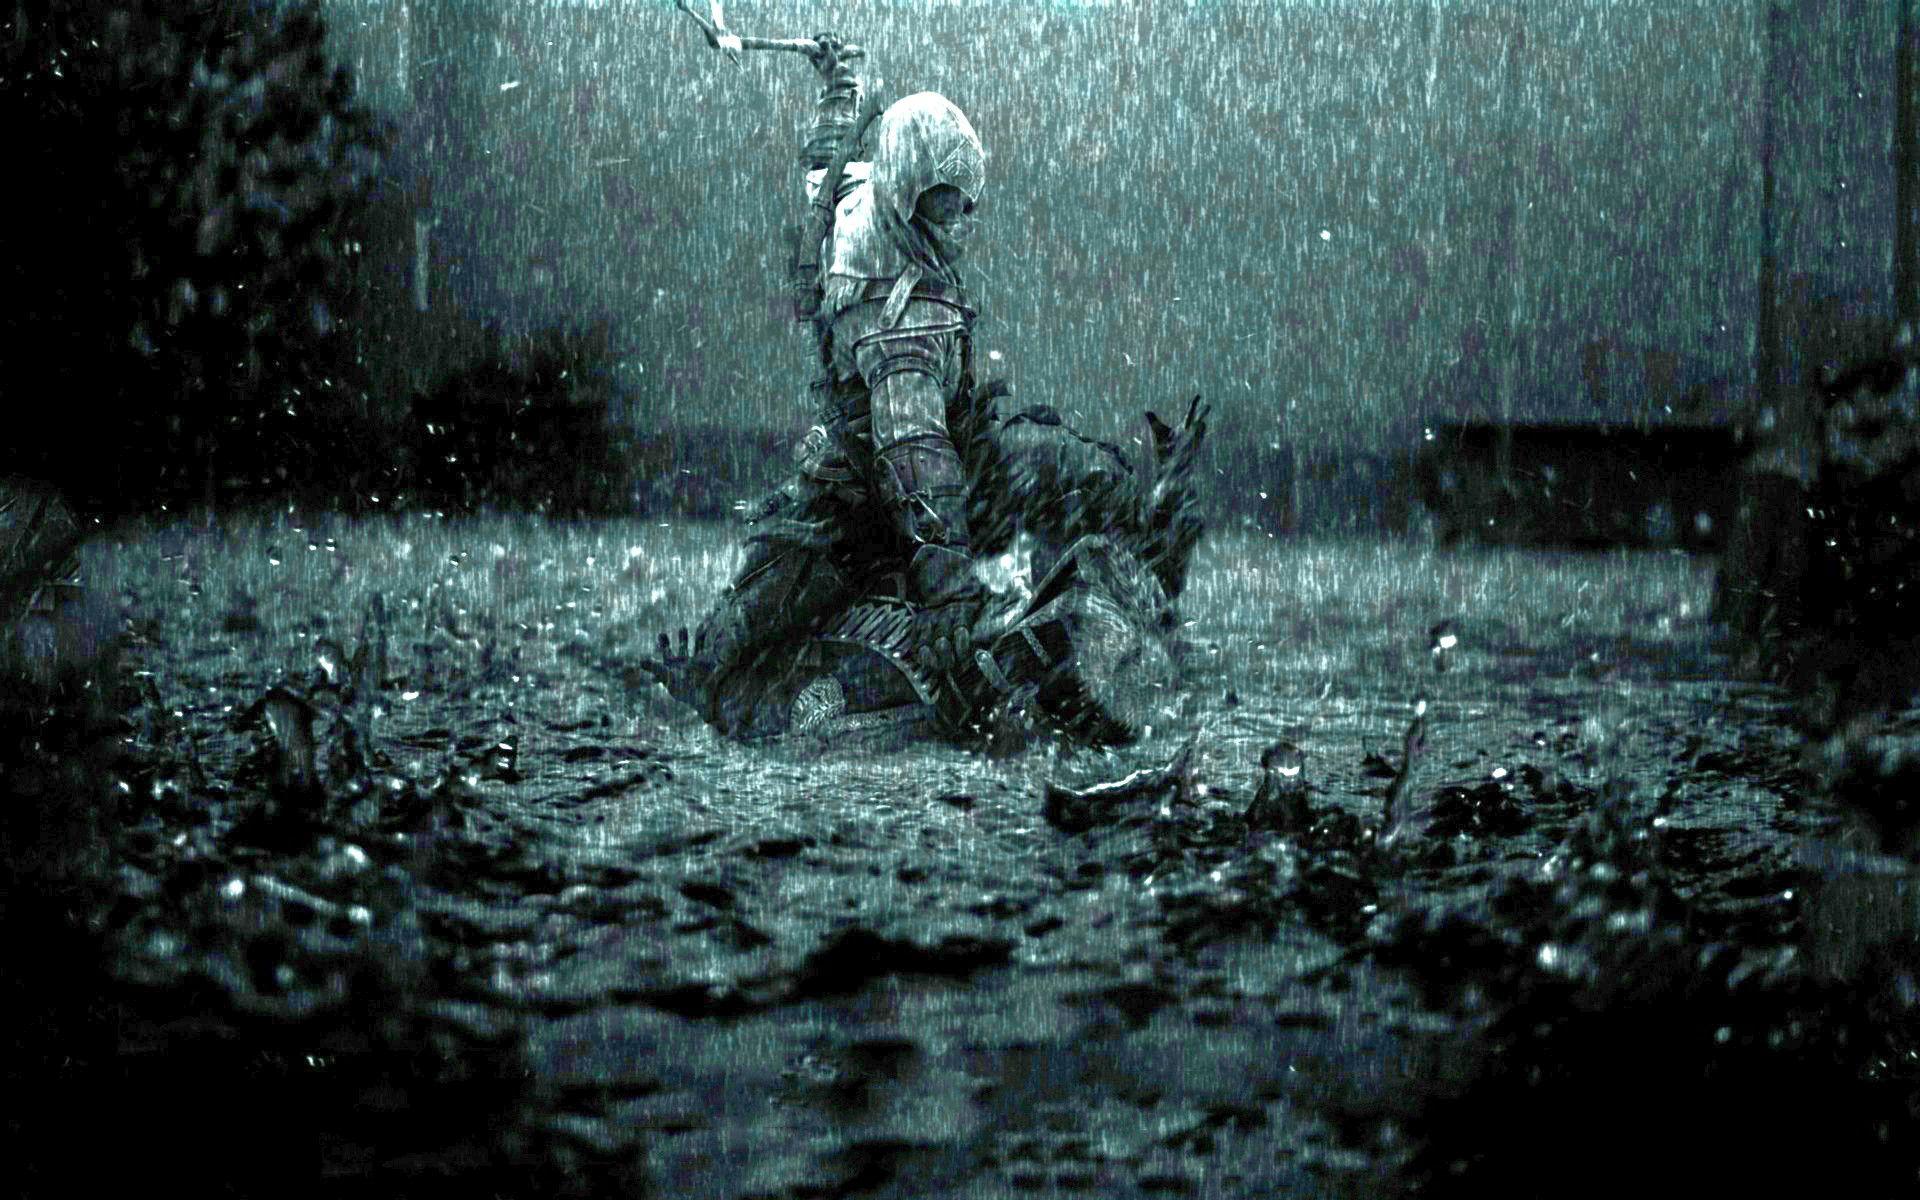 4k Rain Wallpaper 47 Images Rain Wallpapers Rain Art Assassins Creed Art